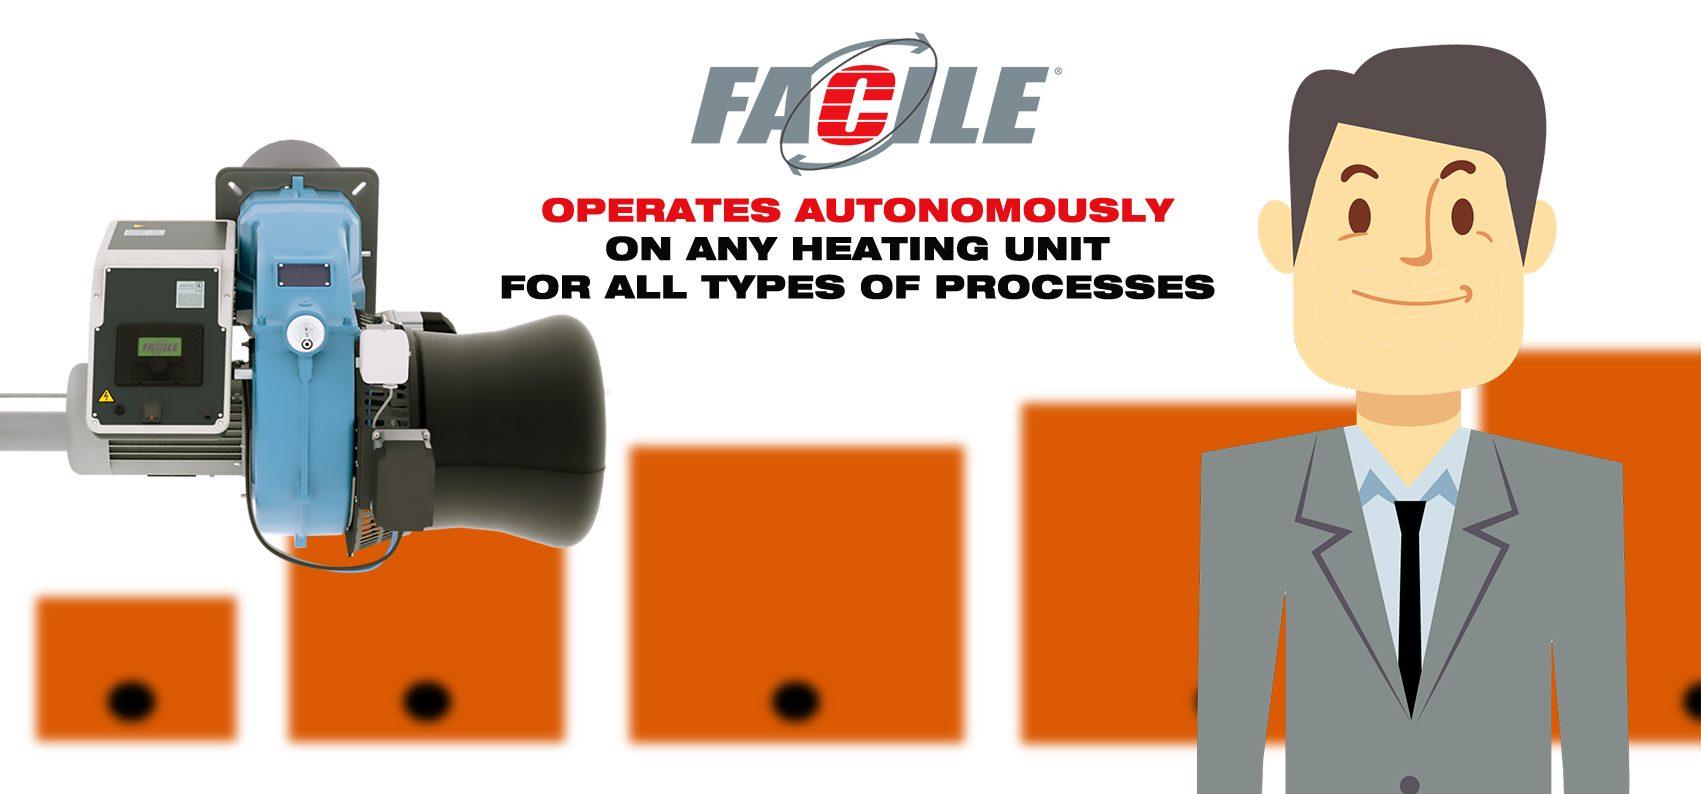 FACILE CIB Unigas operates autonomously on any heating unit